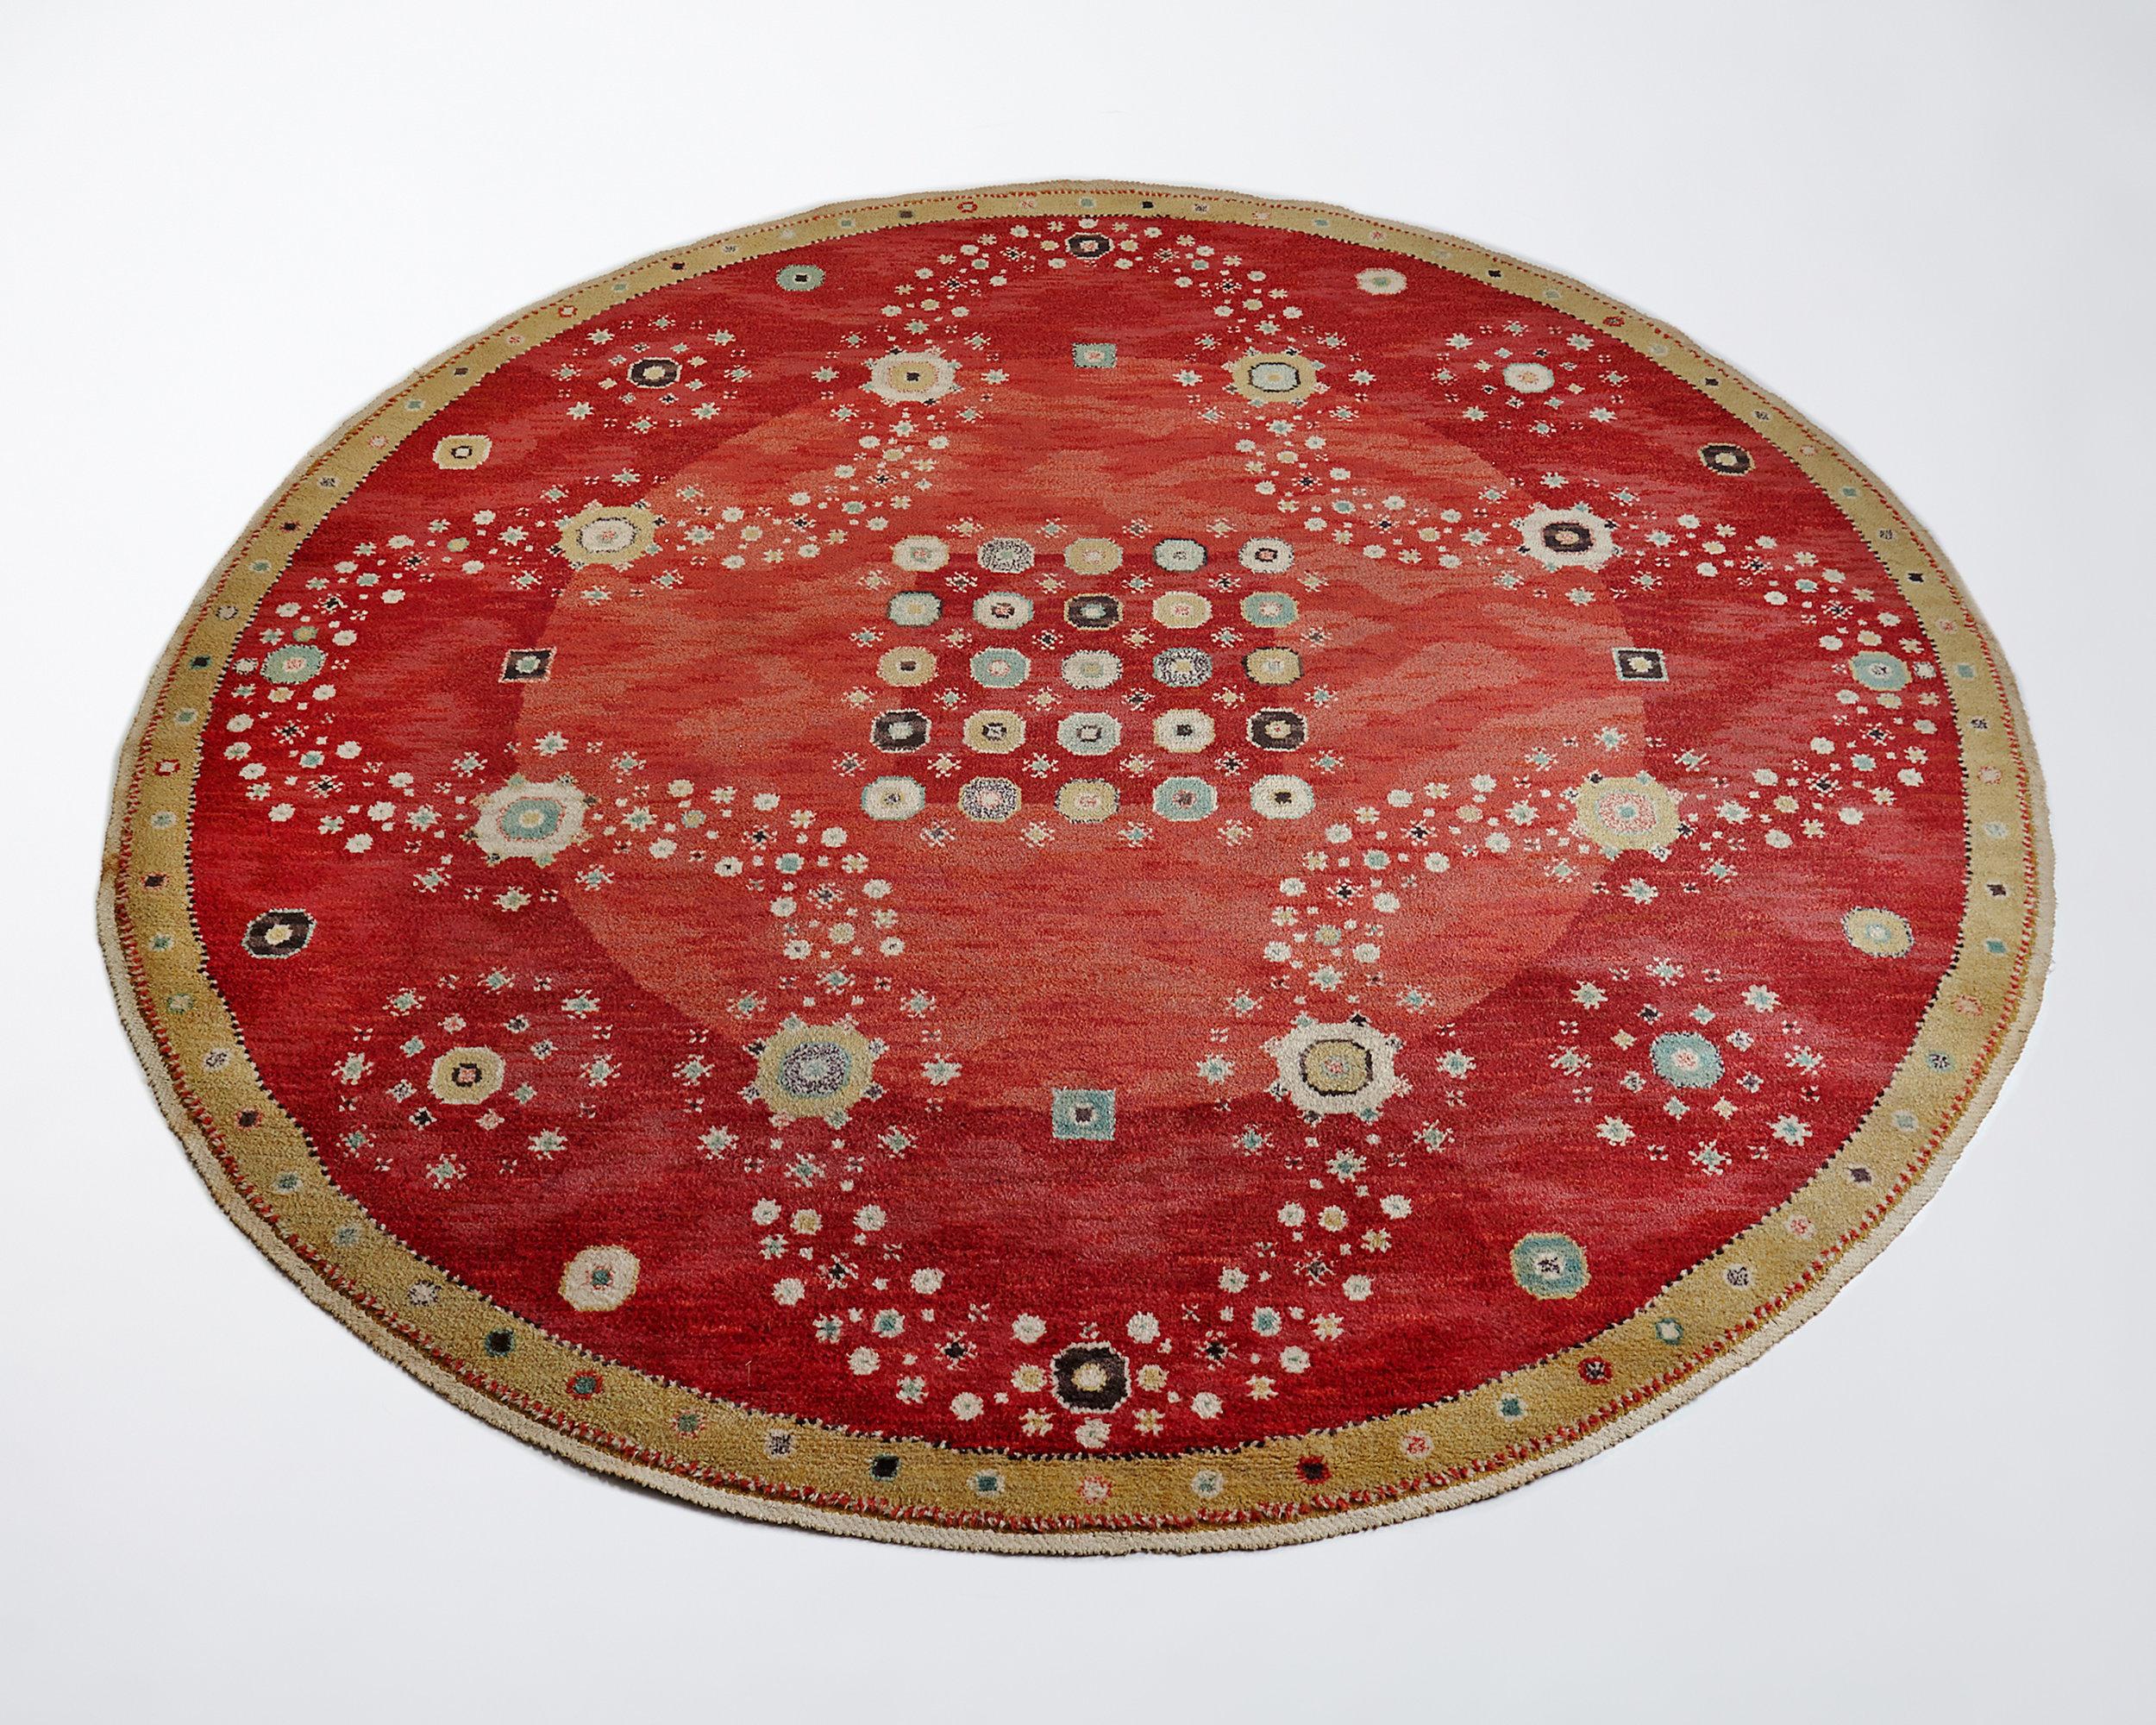 Barbro Nilsson, MMF  Red Flowerbed Sweden, 1944 Handwoven wool. Pile technique. Diameter: 290 cm